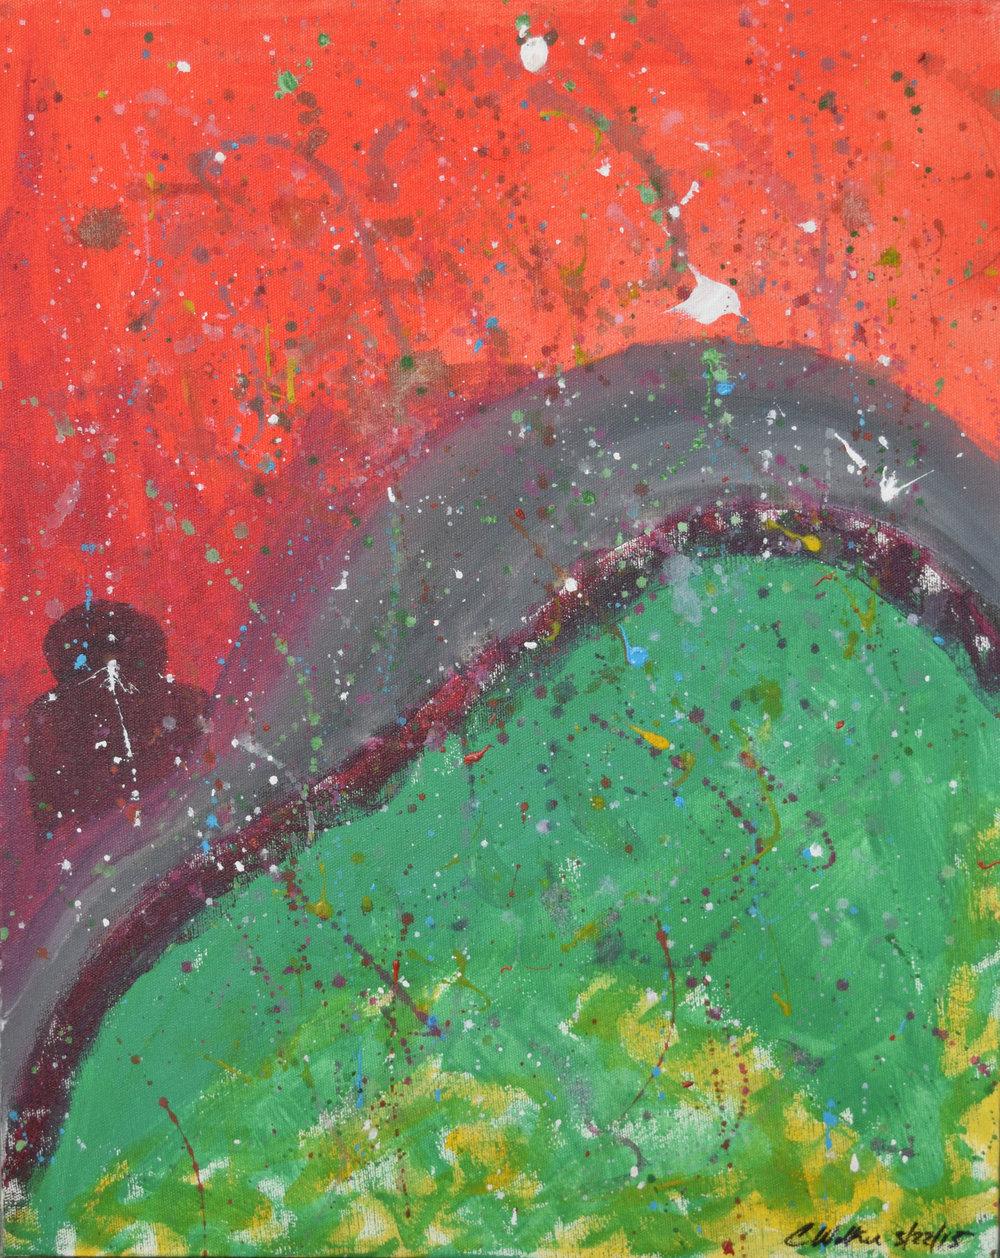 """BRIDGE"" 16x20, Acrylic on Canvas"